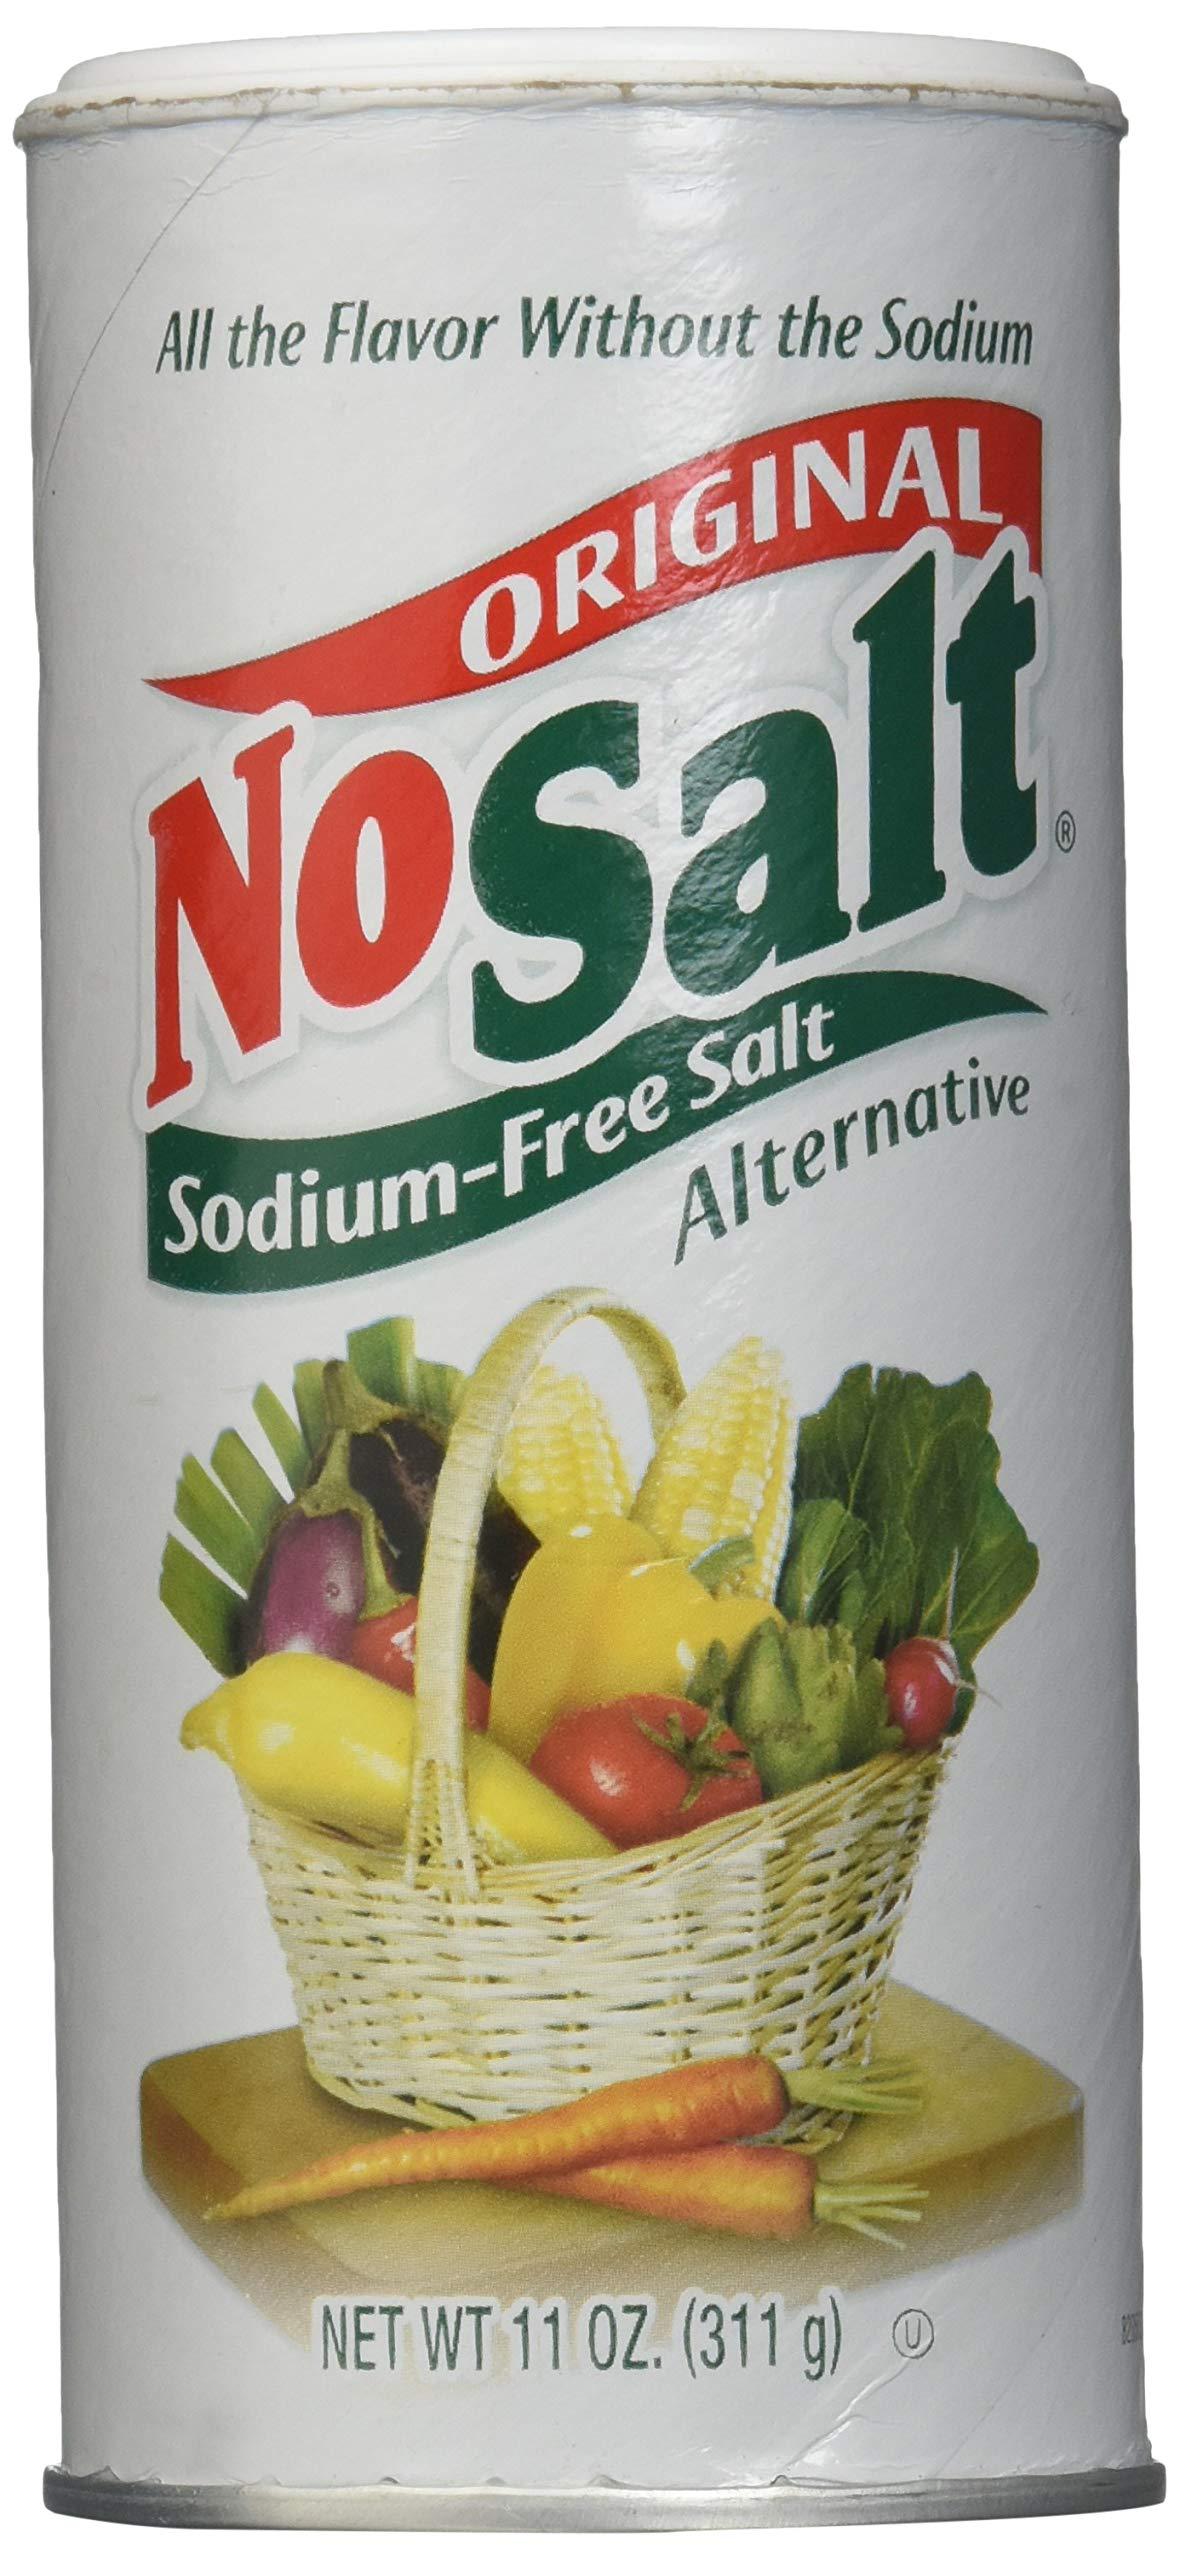 No Salt Salt Alternative Salt Alternative by Nosalt